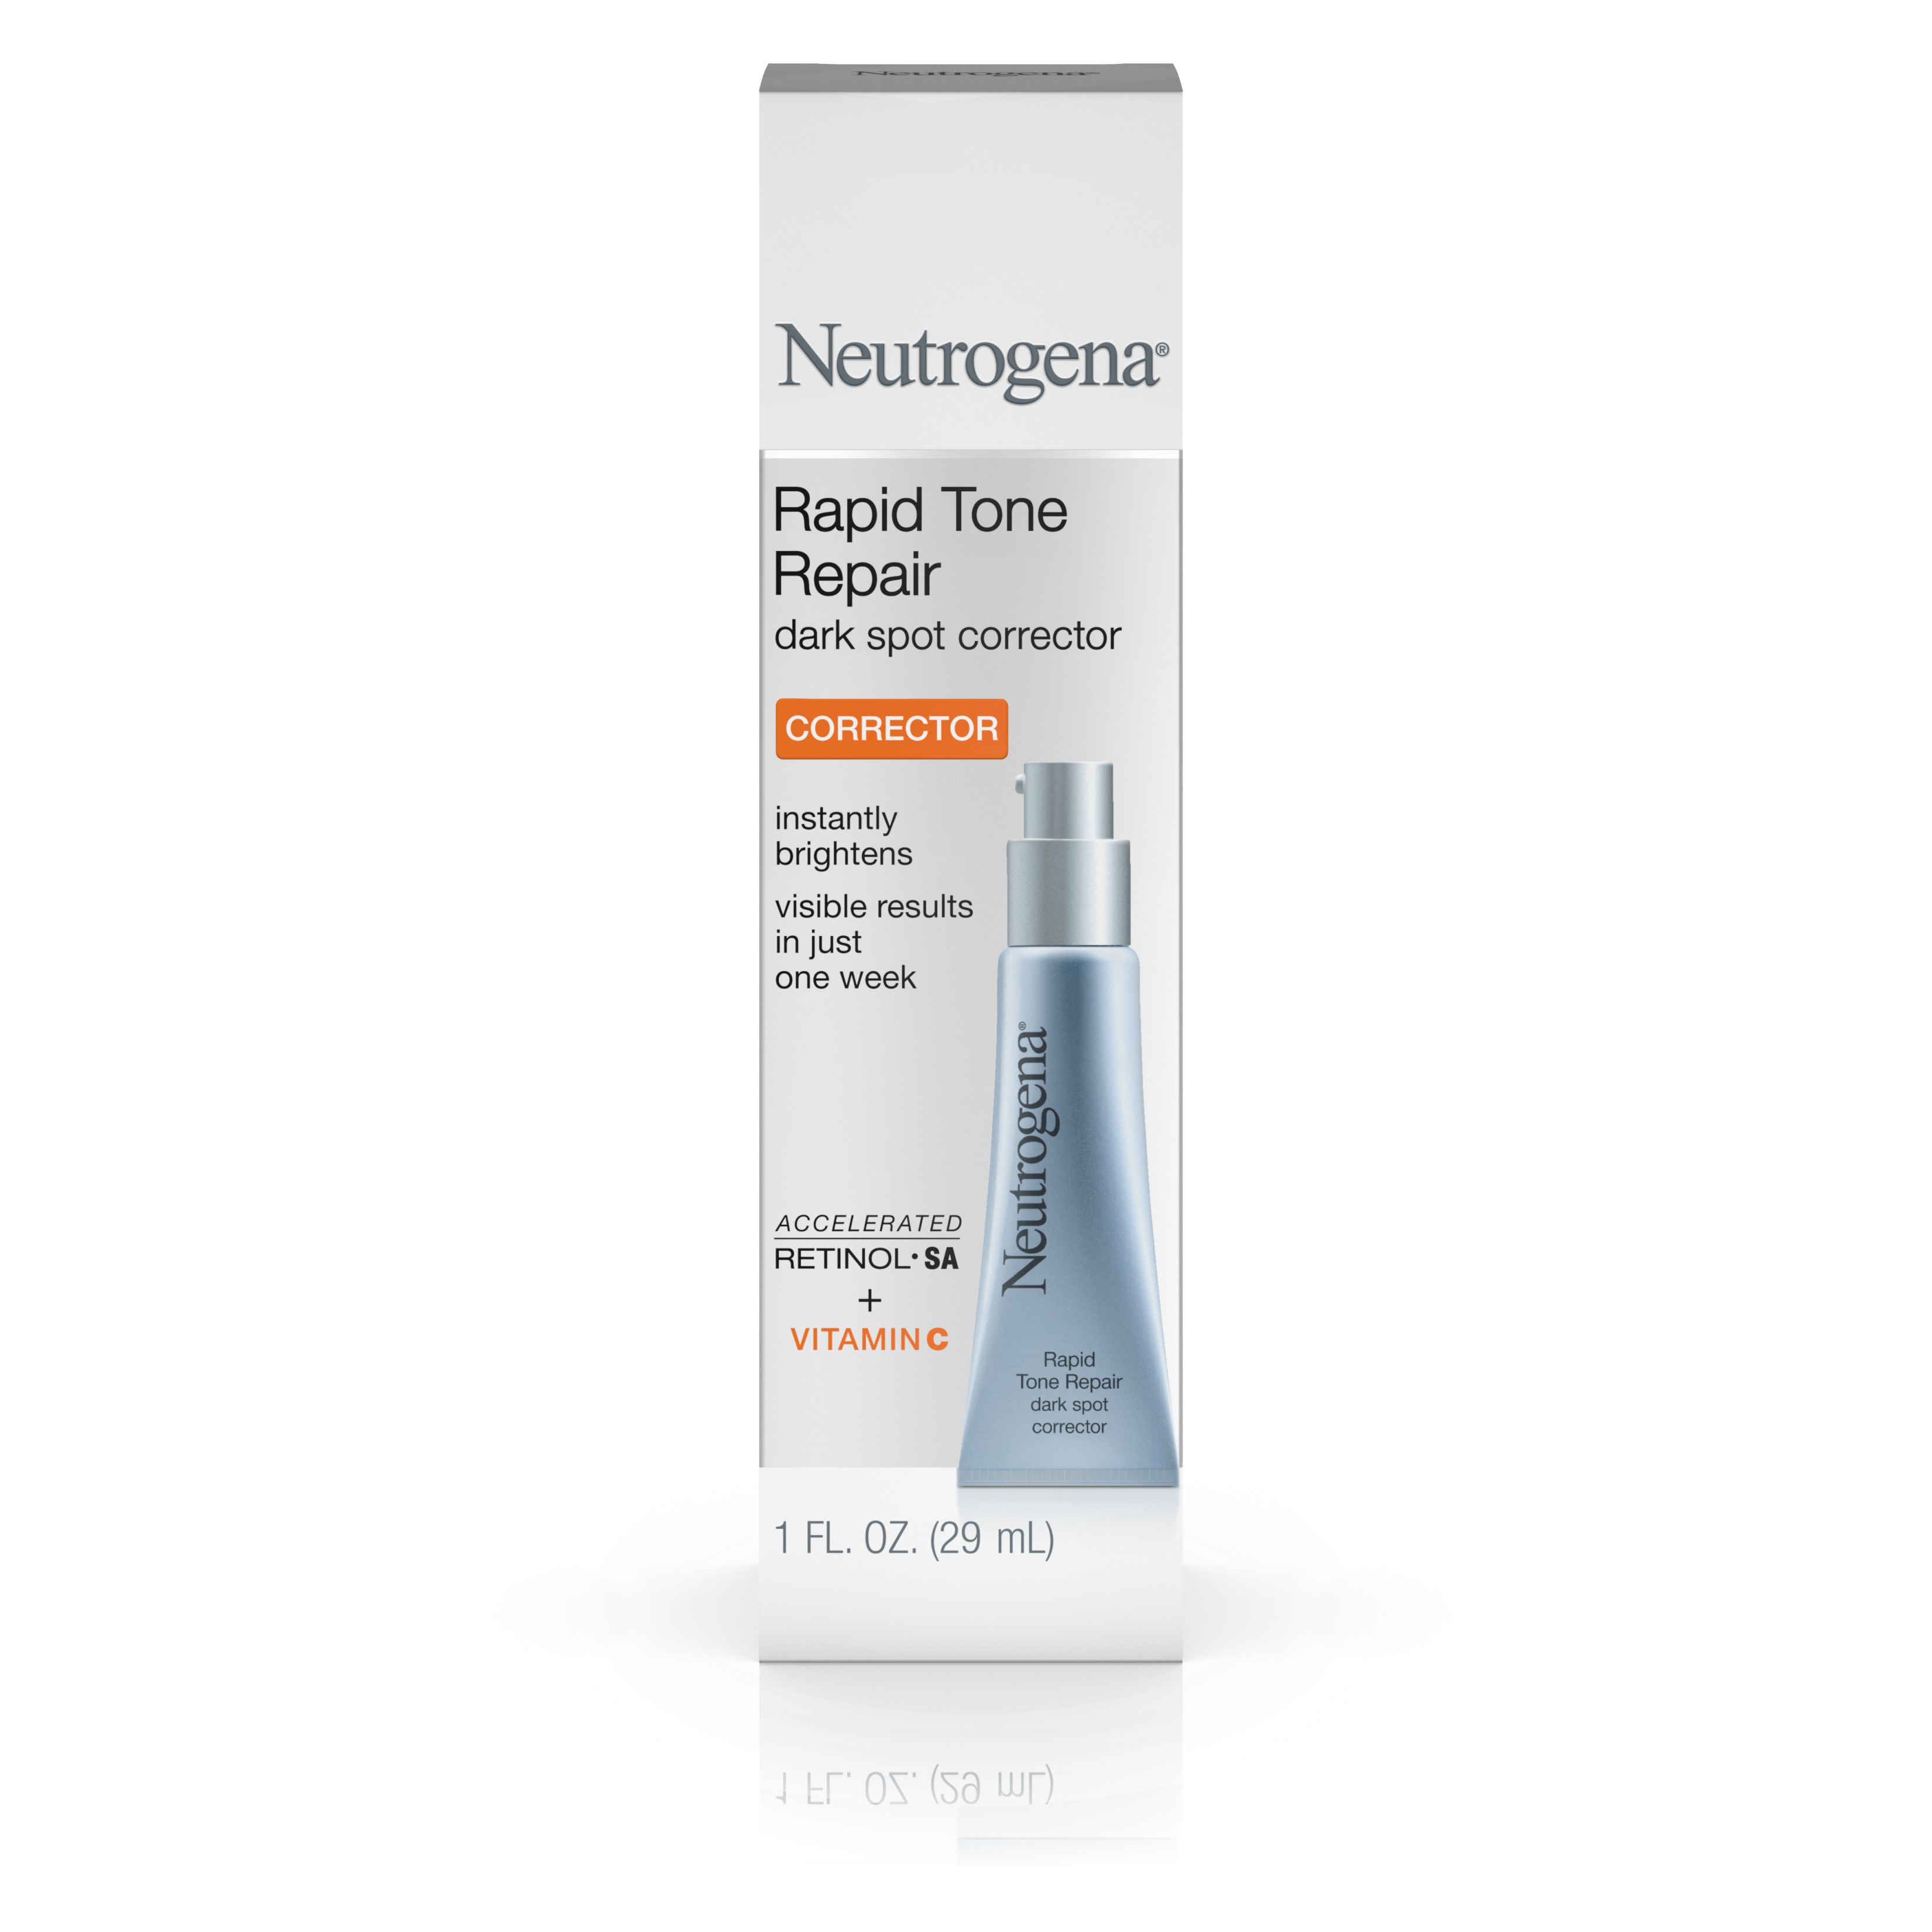 Neutrogena Rapid Tone Repair Dark Spot Corrector, 1 Oz - Walmart.com